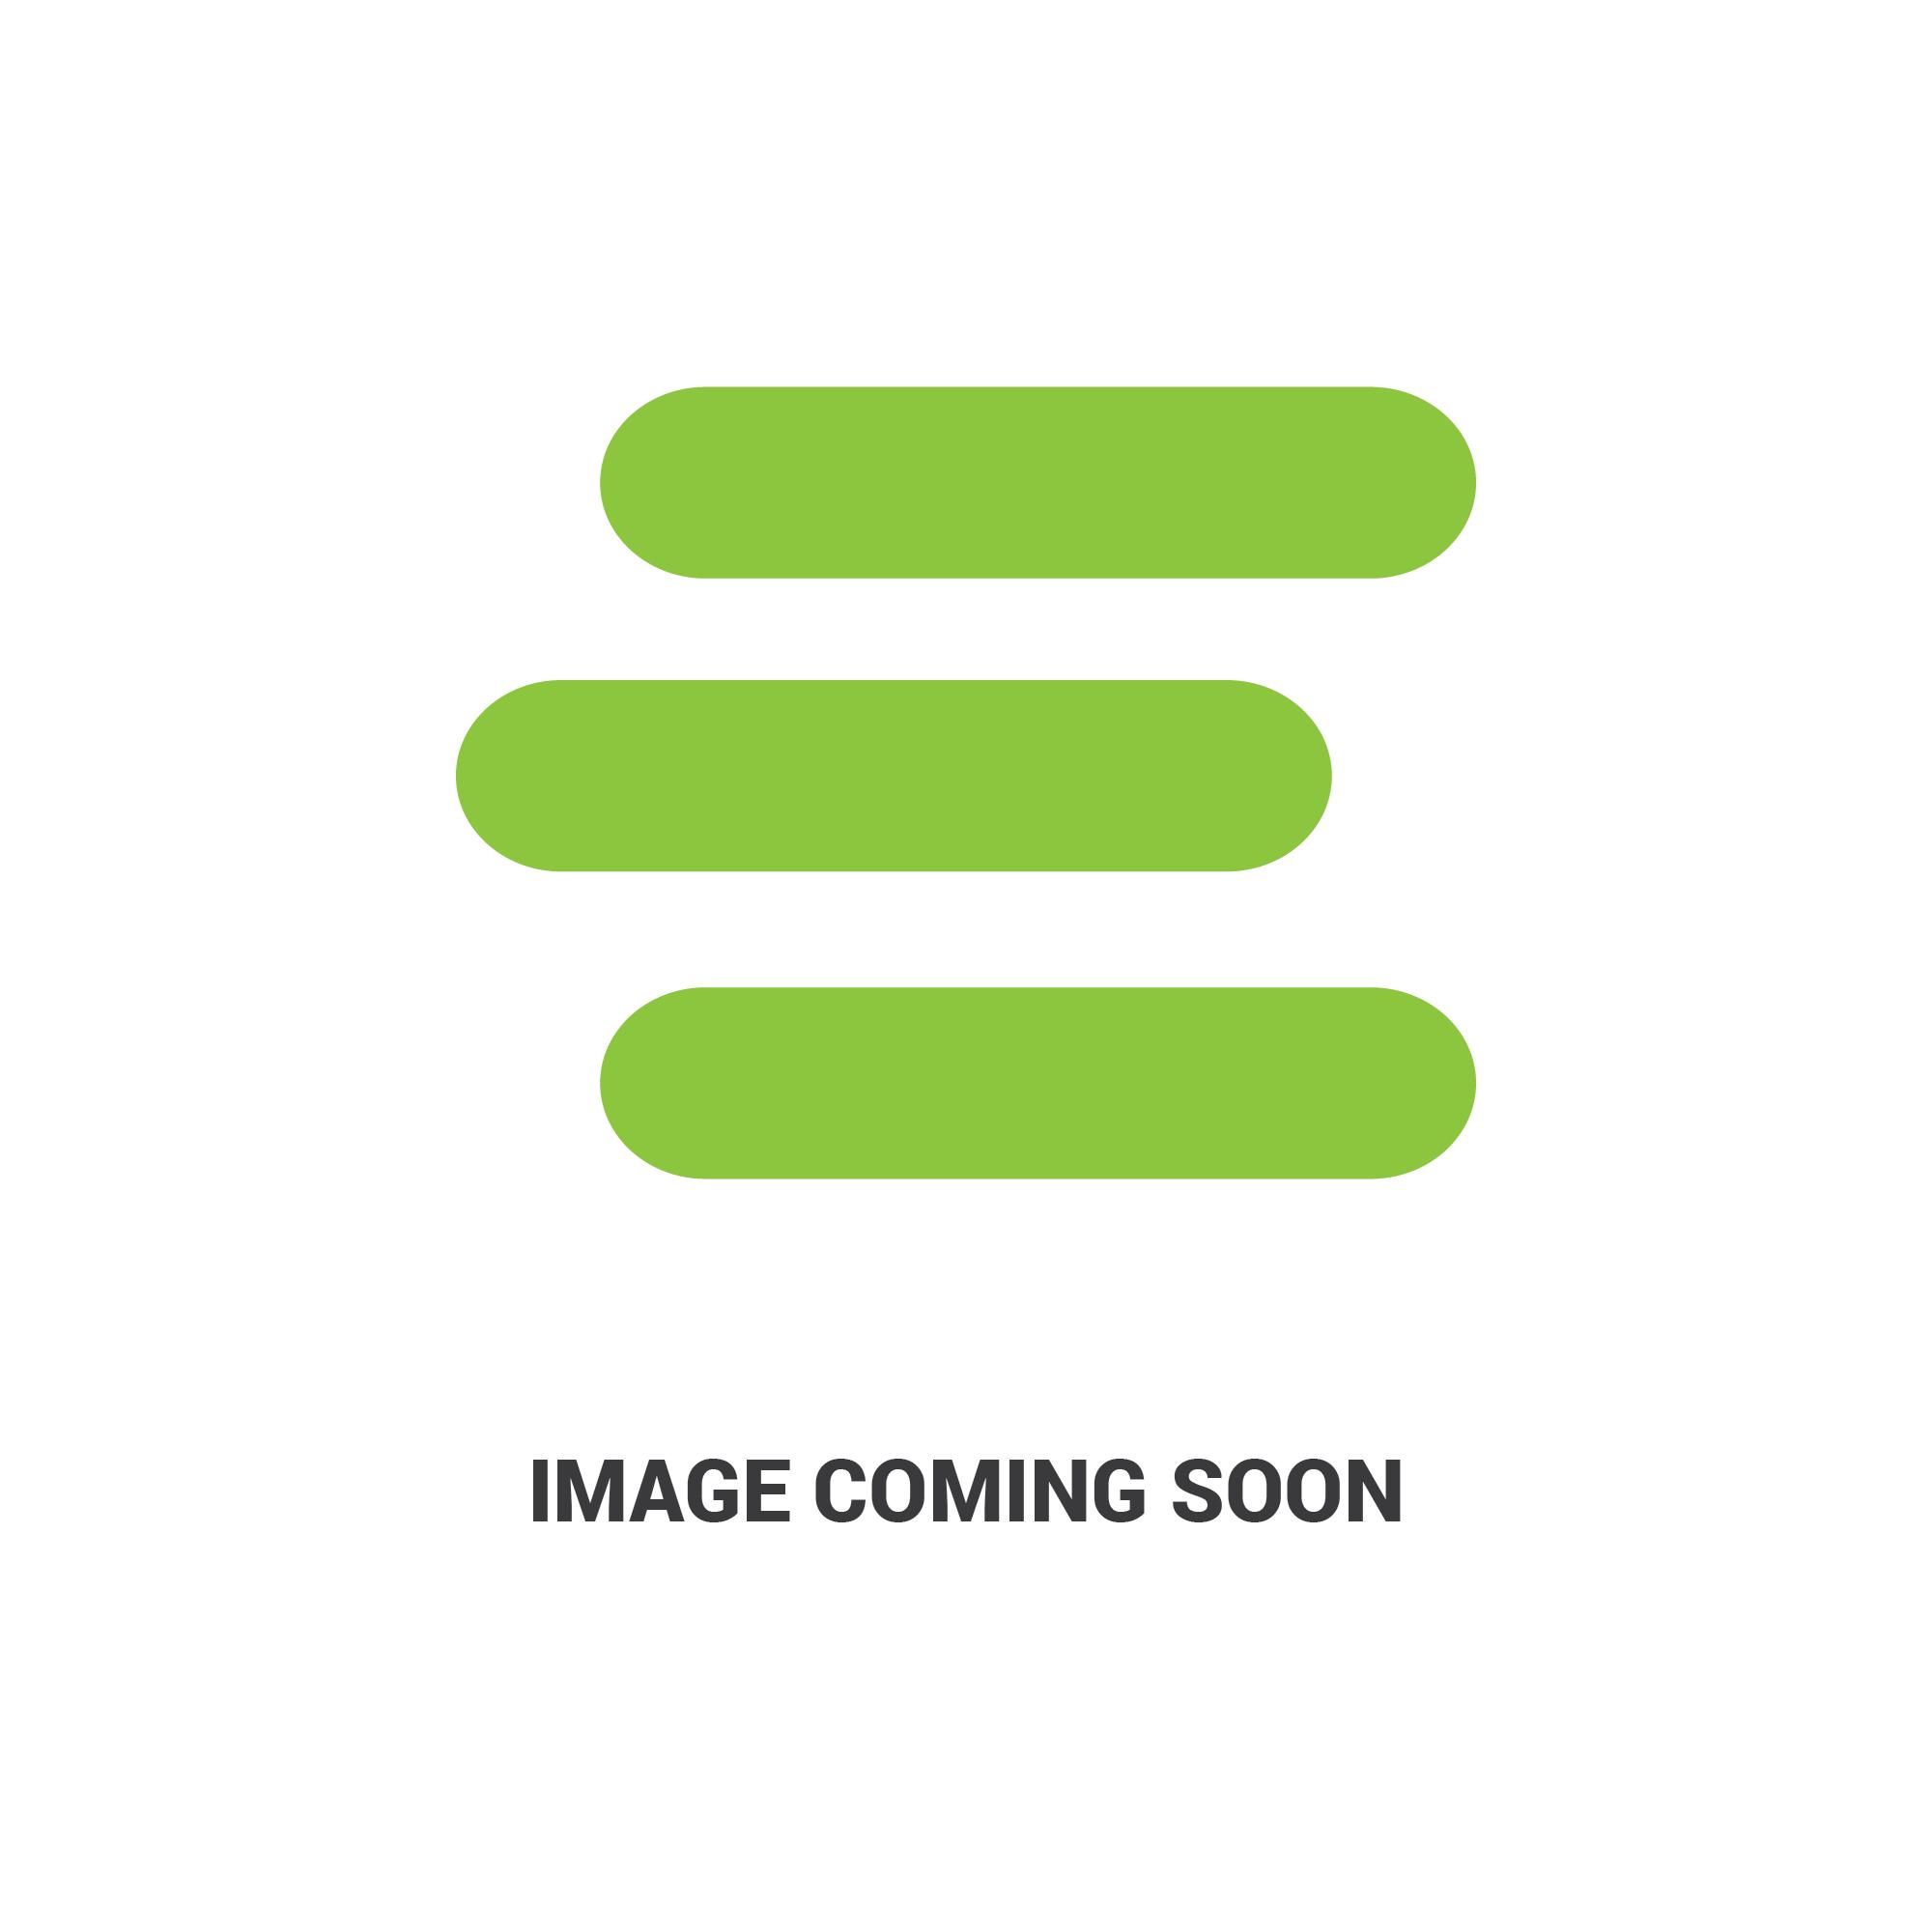 E-66582452554_1 .jpg